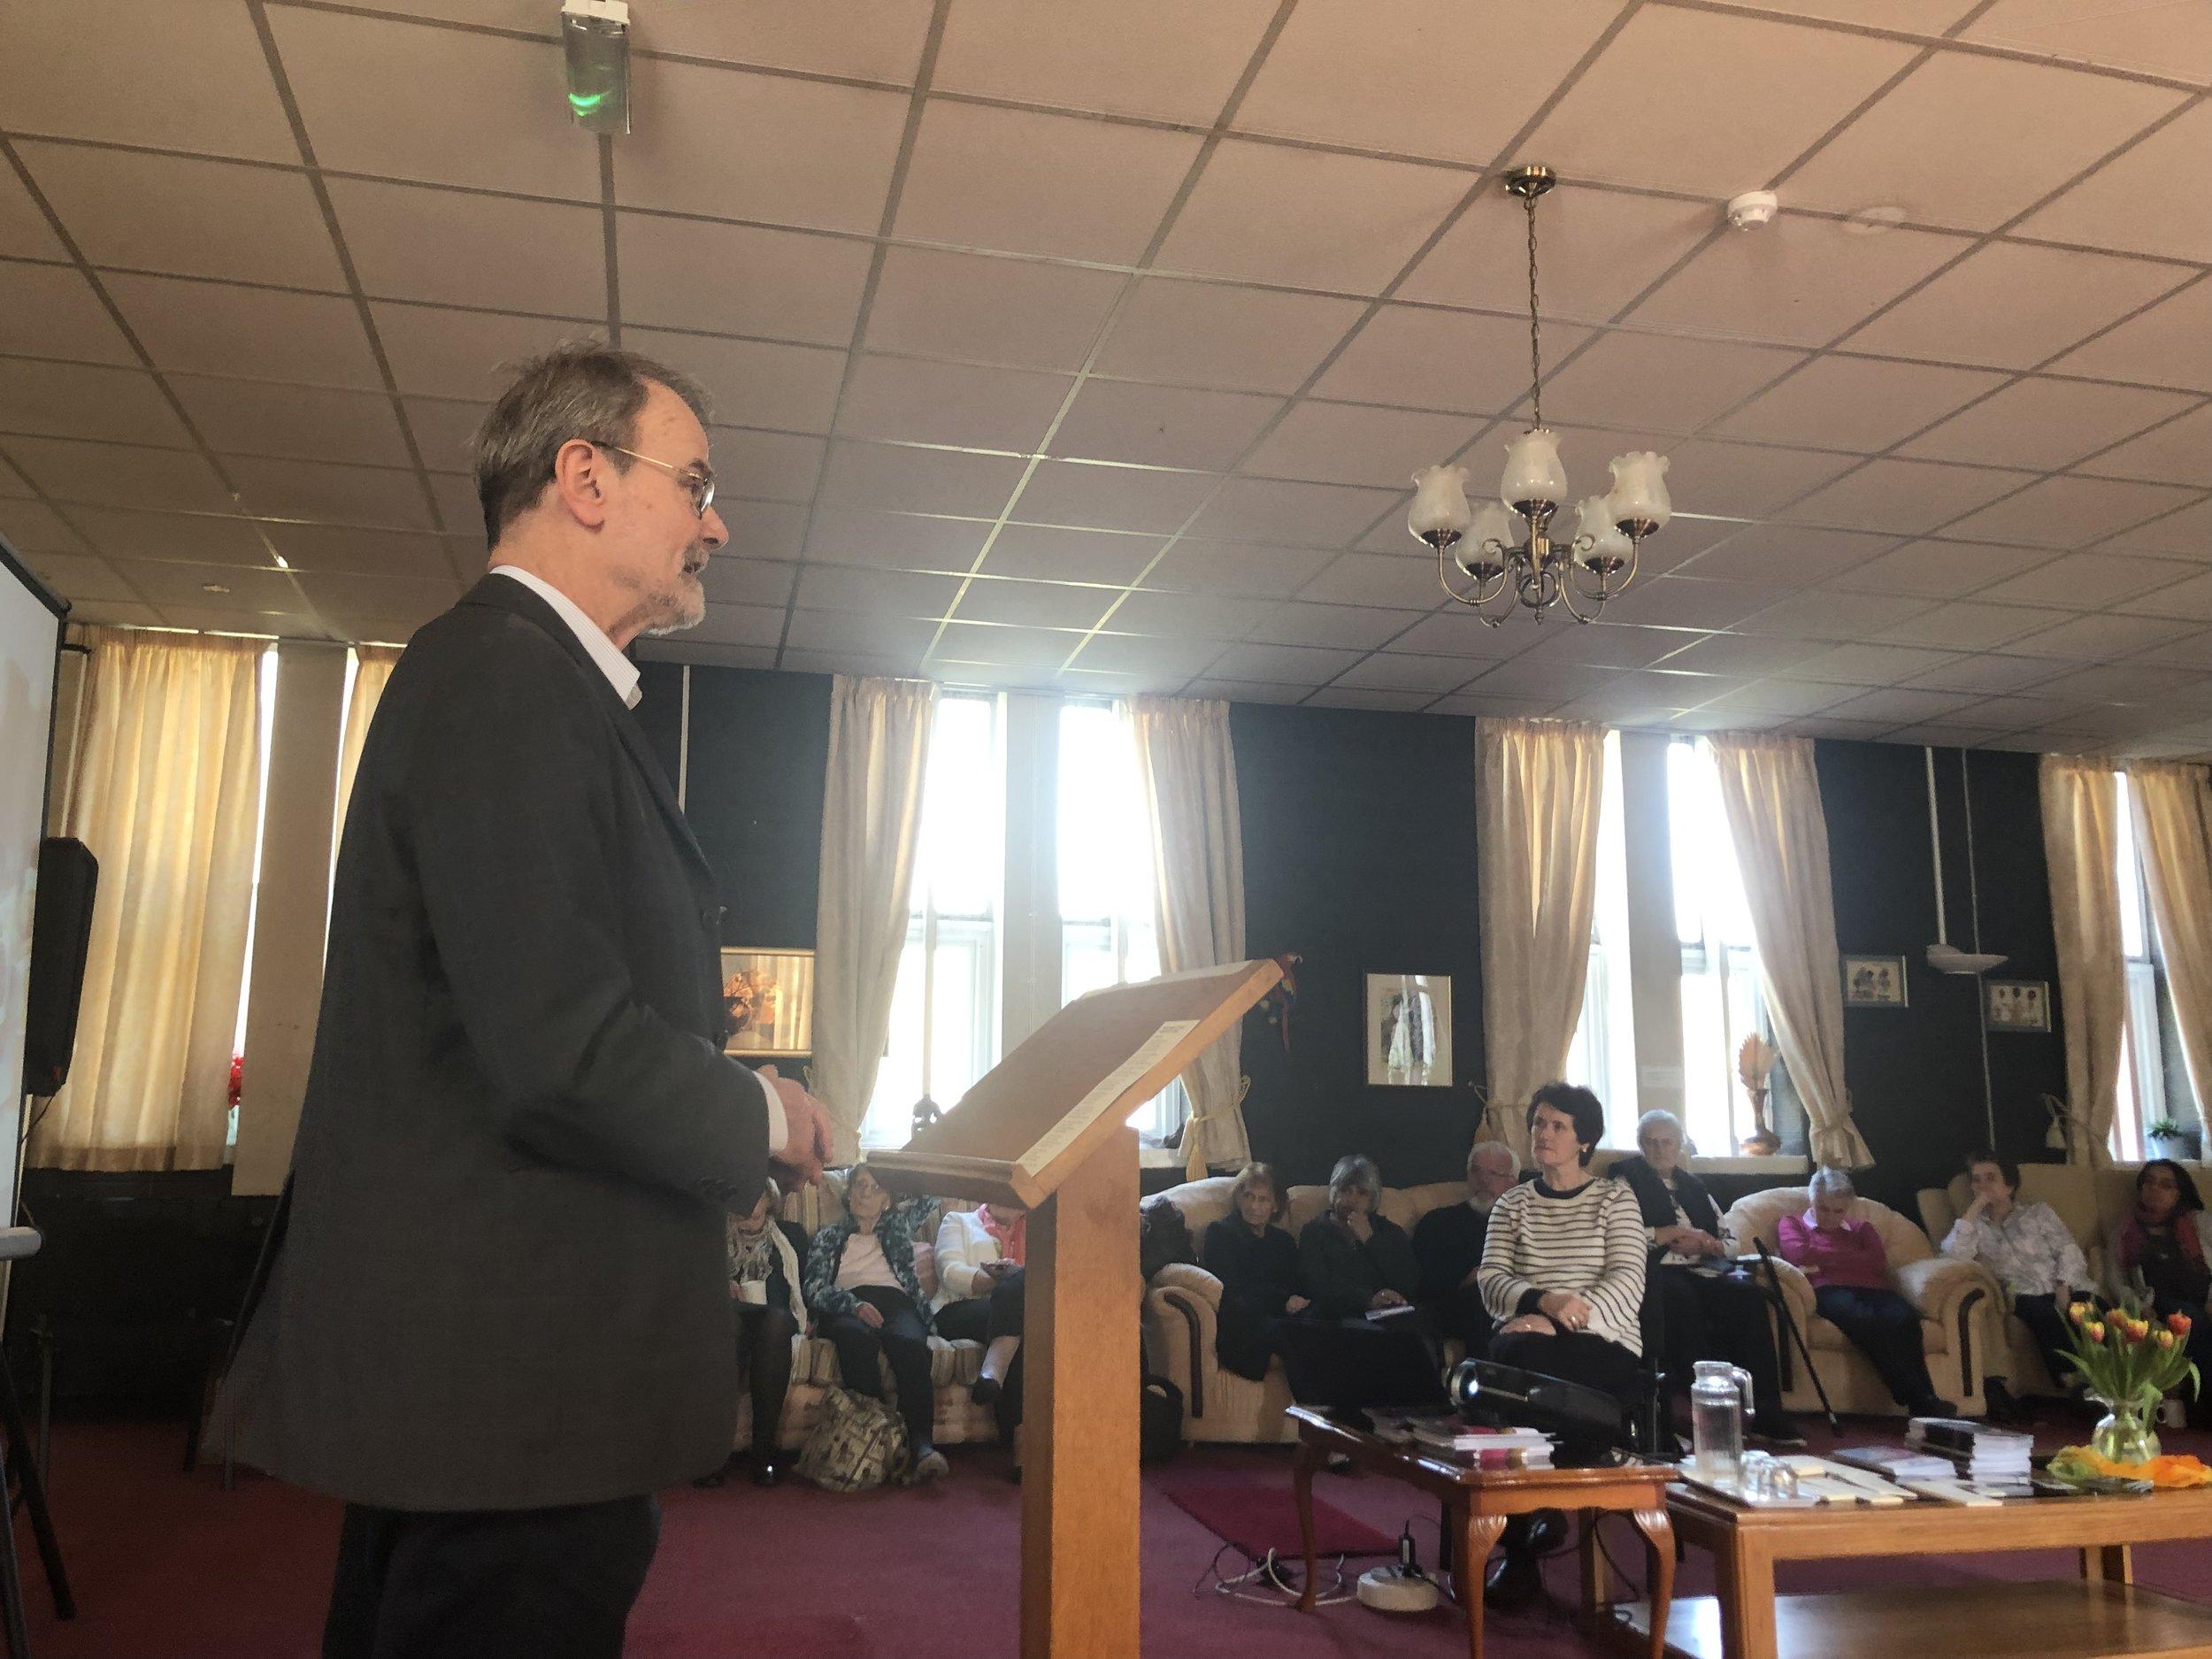 Anthony Brown of Caritas in Salford Diocese